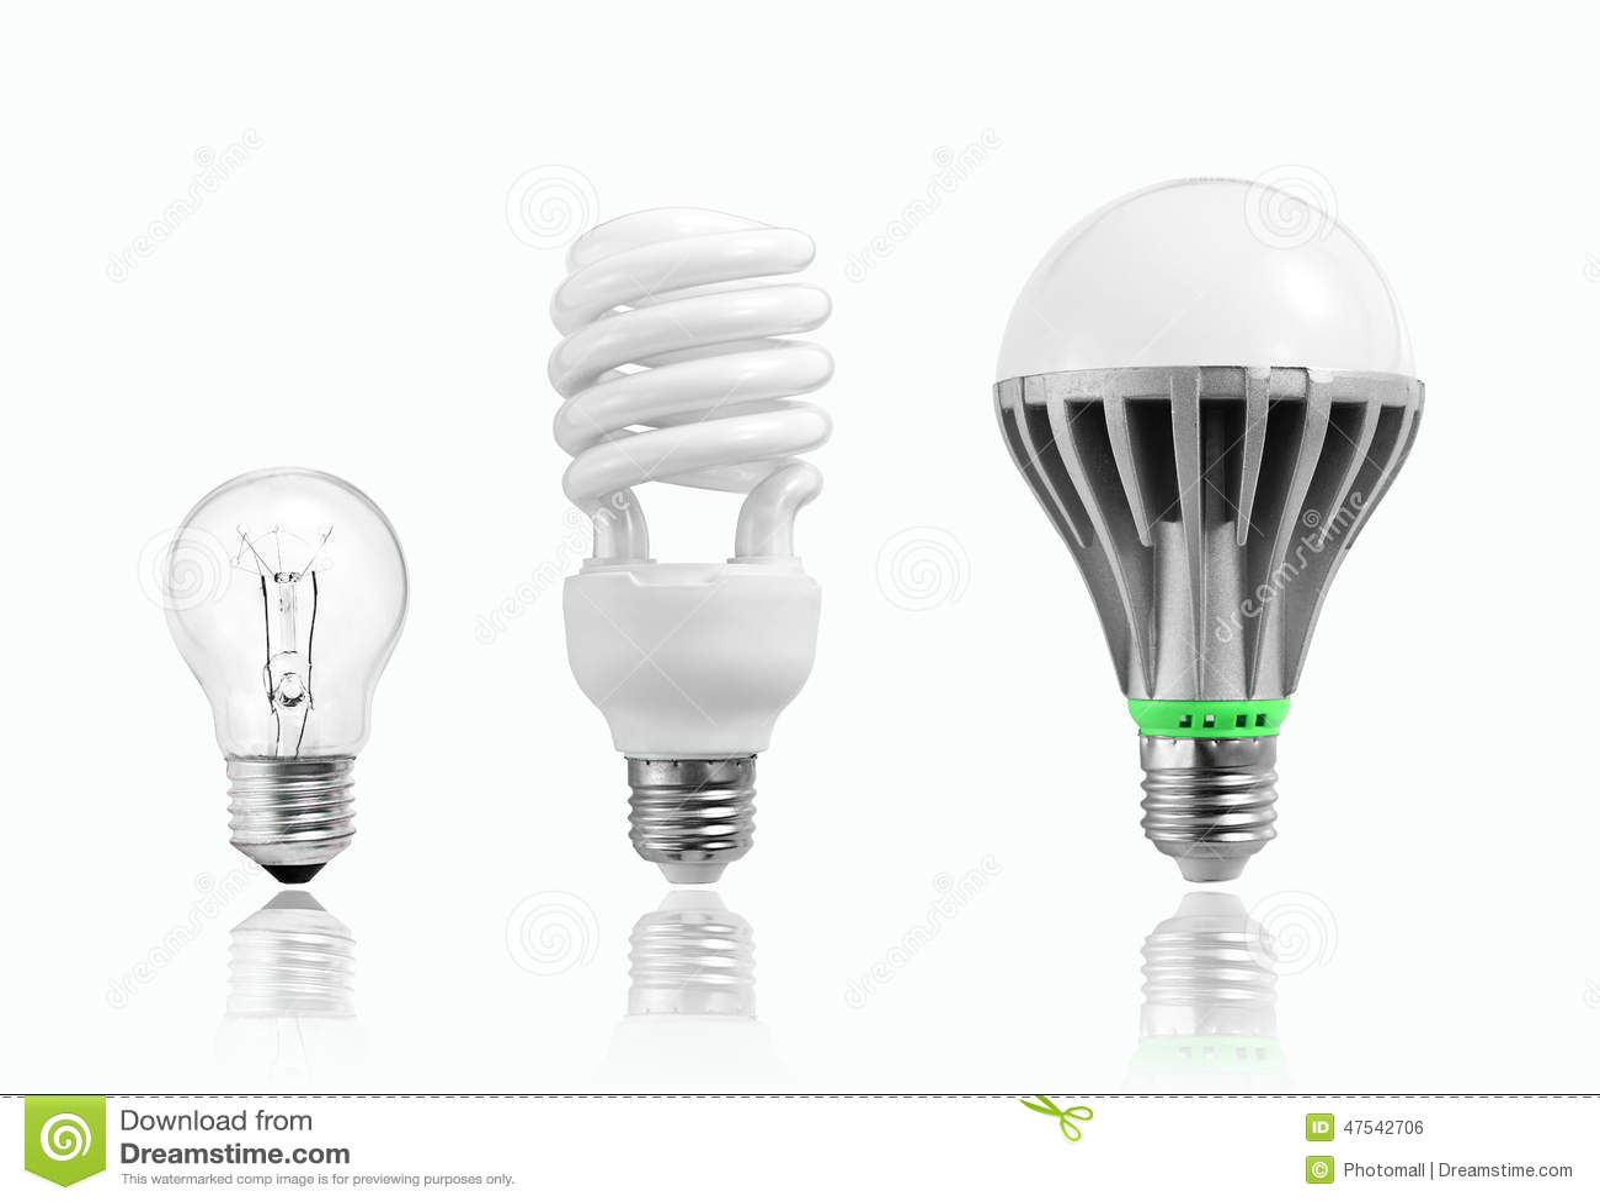 LED电灯泡,钨电灯泡,白炽电灯泡,日光灯,照明设备,节能和环境保护的演变